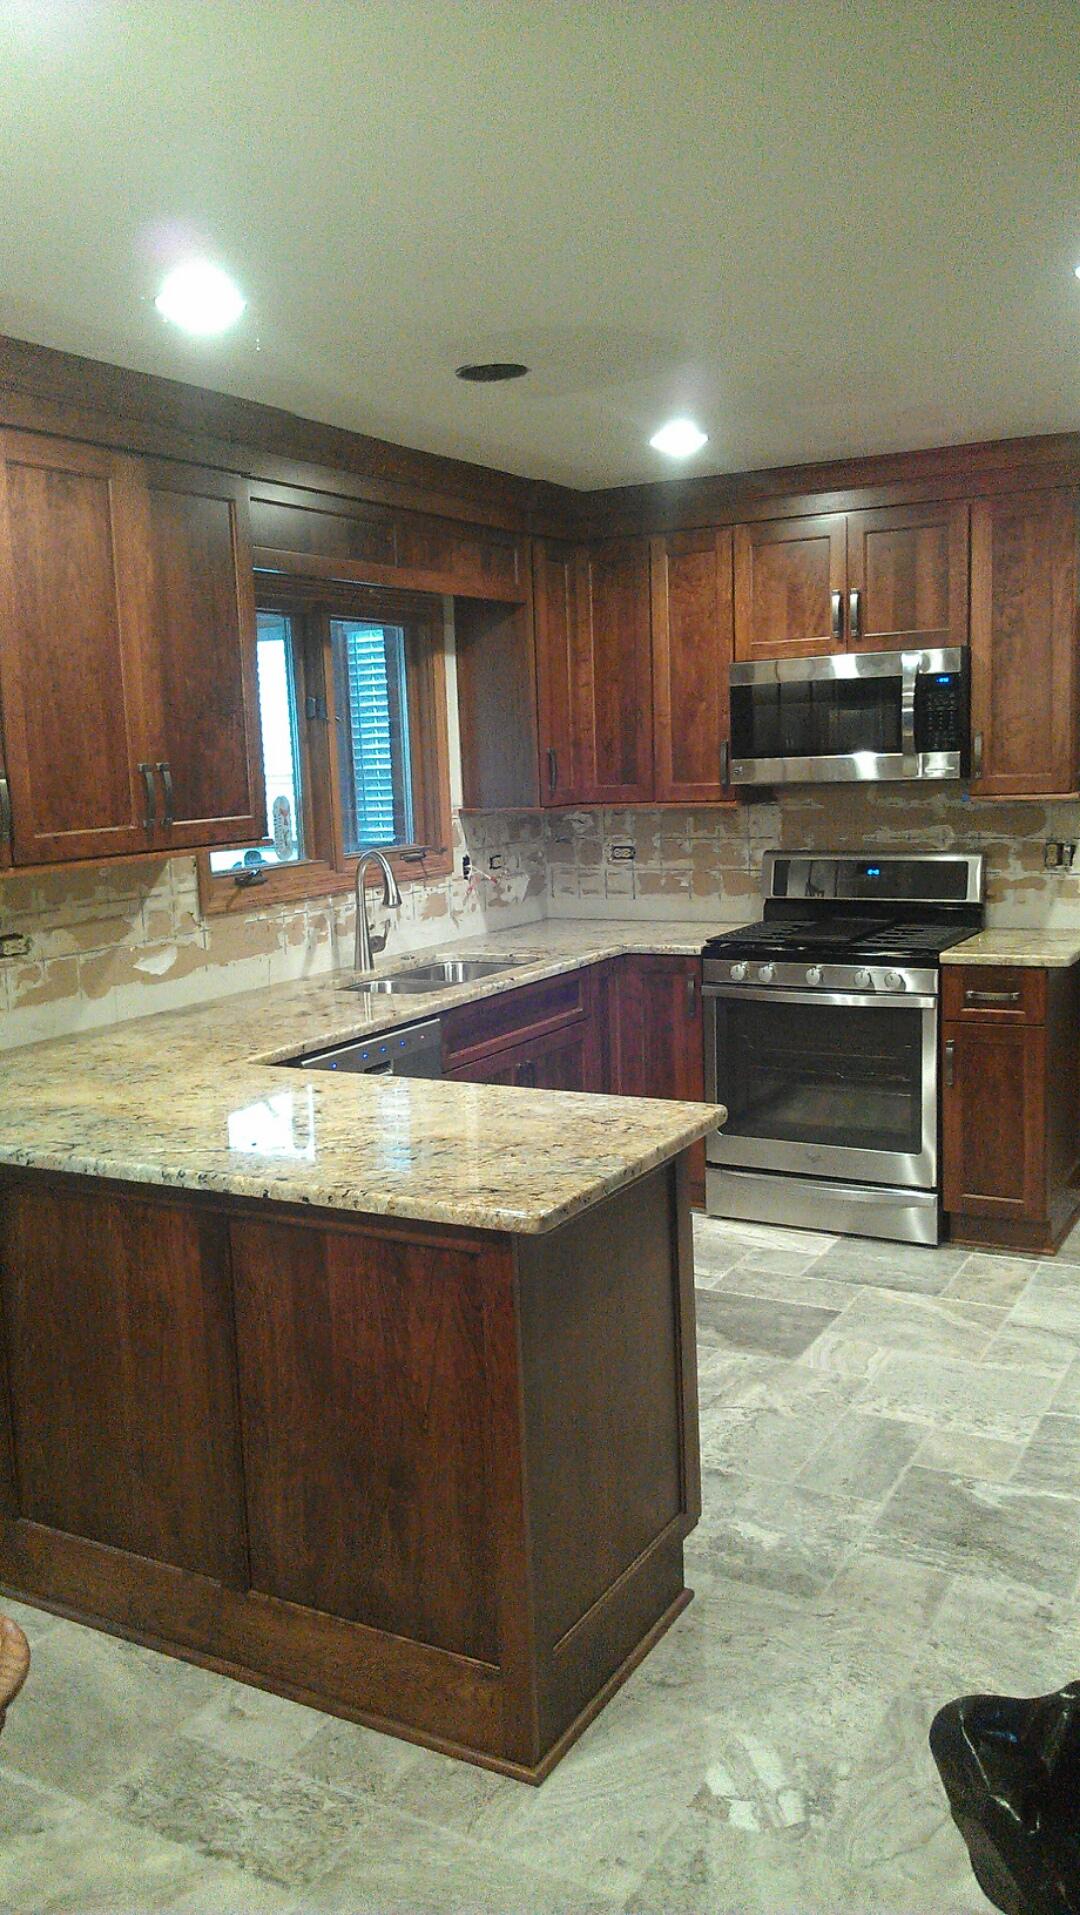 Kitchen Remodeling Darien - JW COnstruction & Design Services